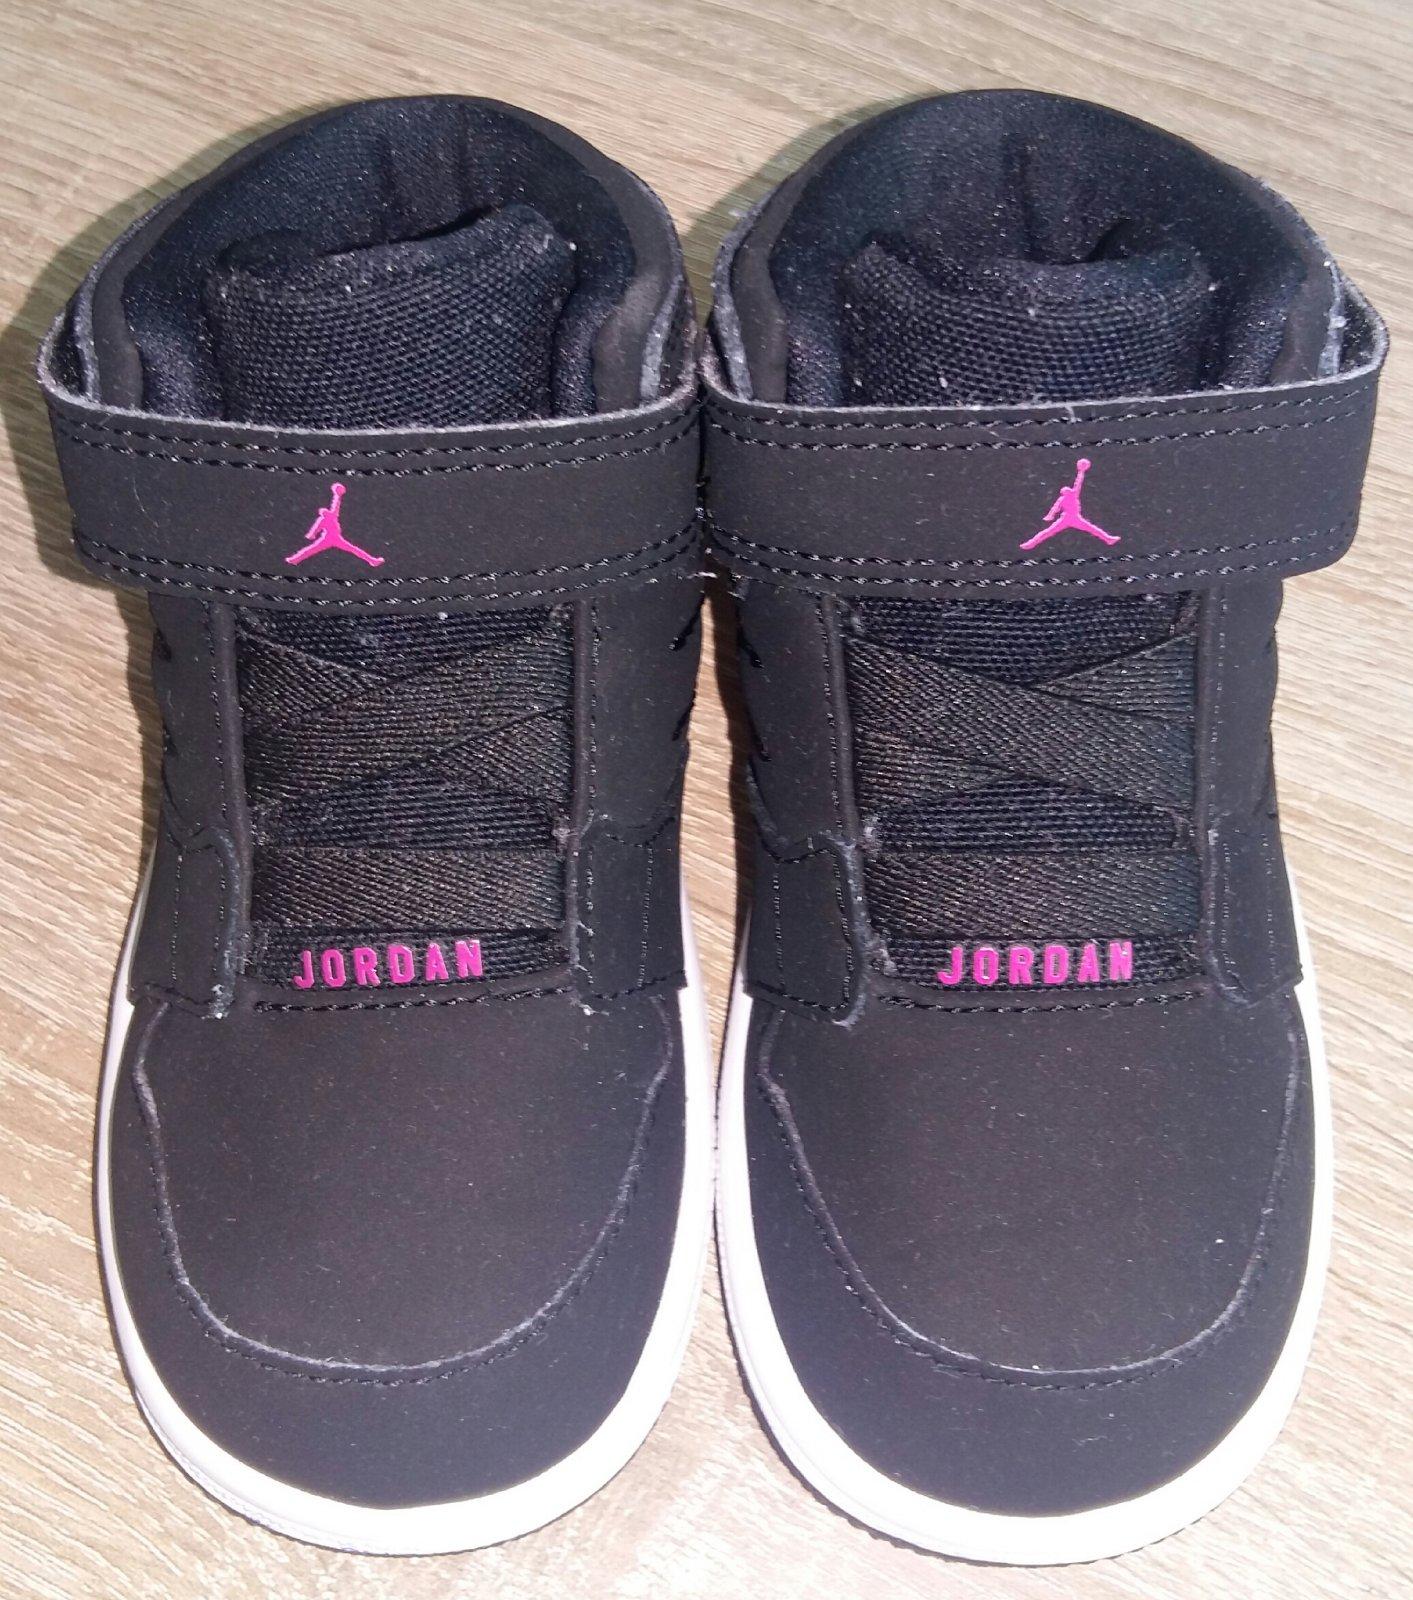 Dětské boty nike jordan 8c86d437db